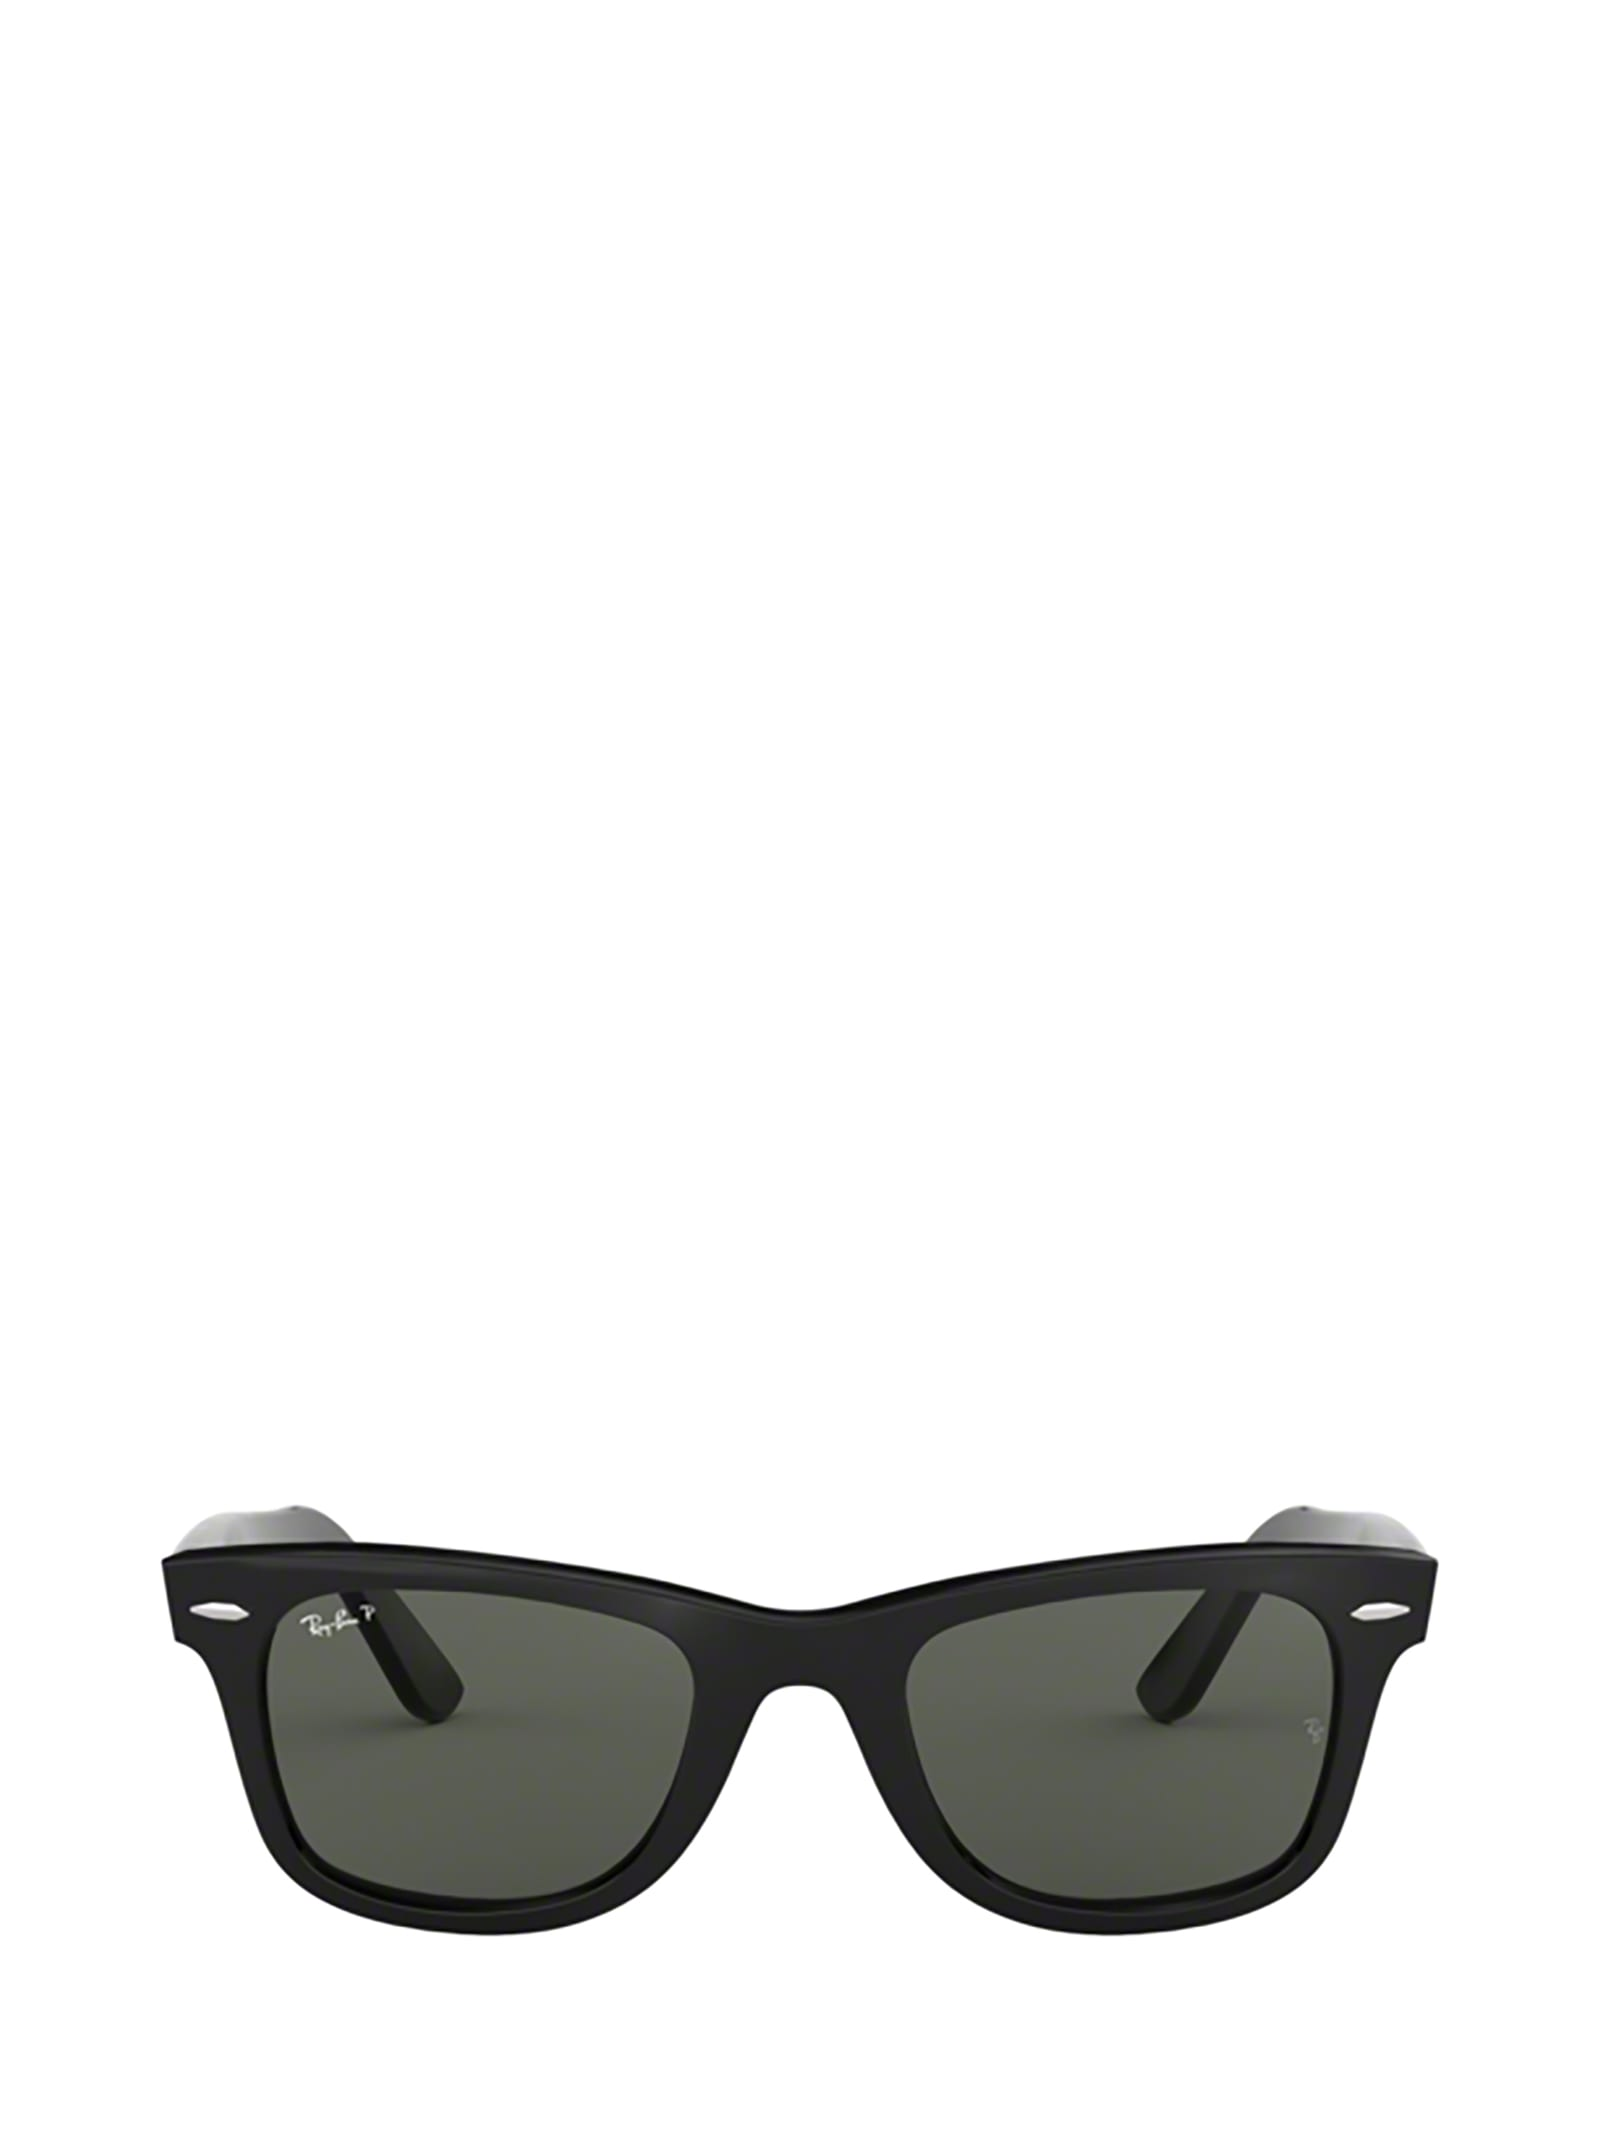 Ray-Ban Ray-ban Rb2140 Black Sunglasses